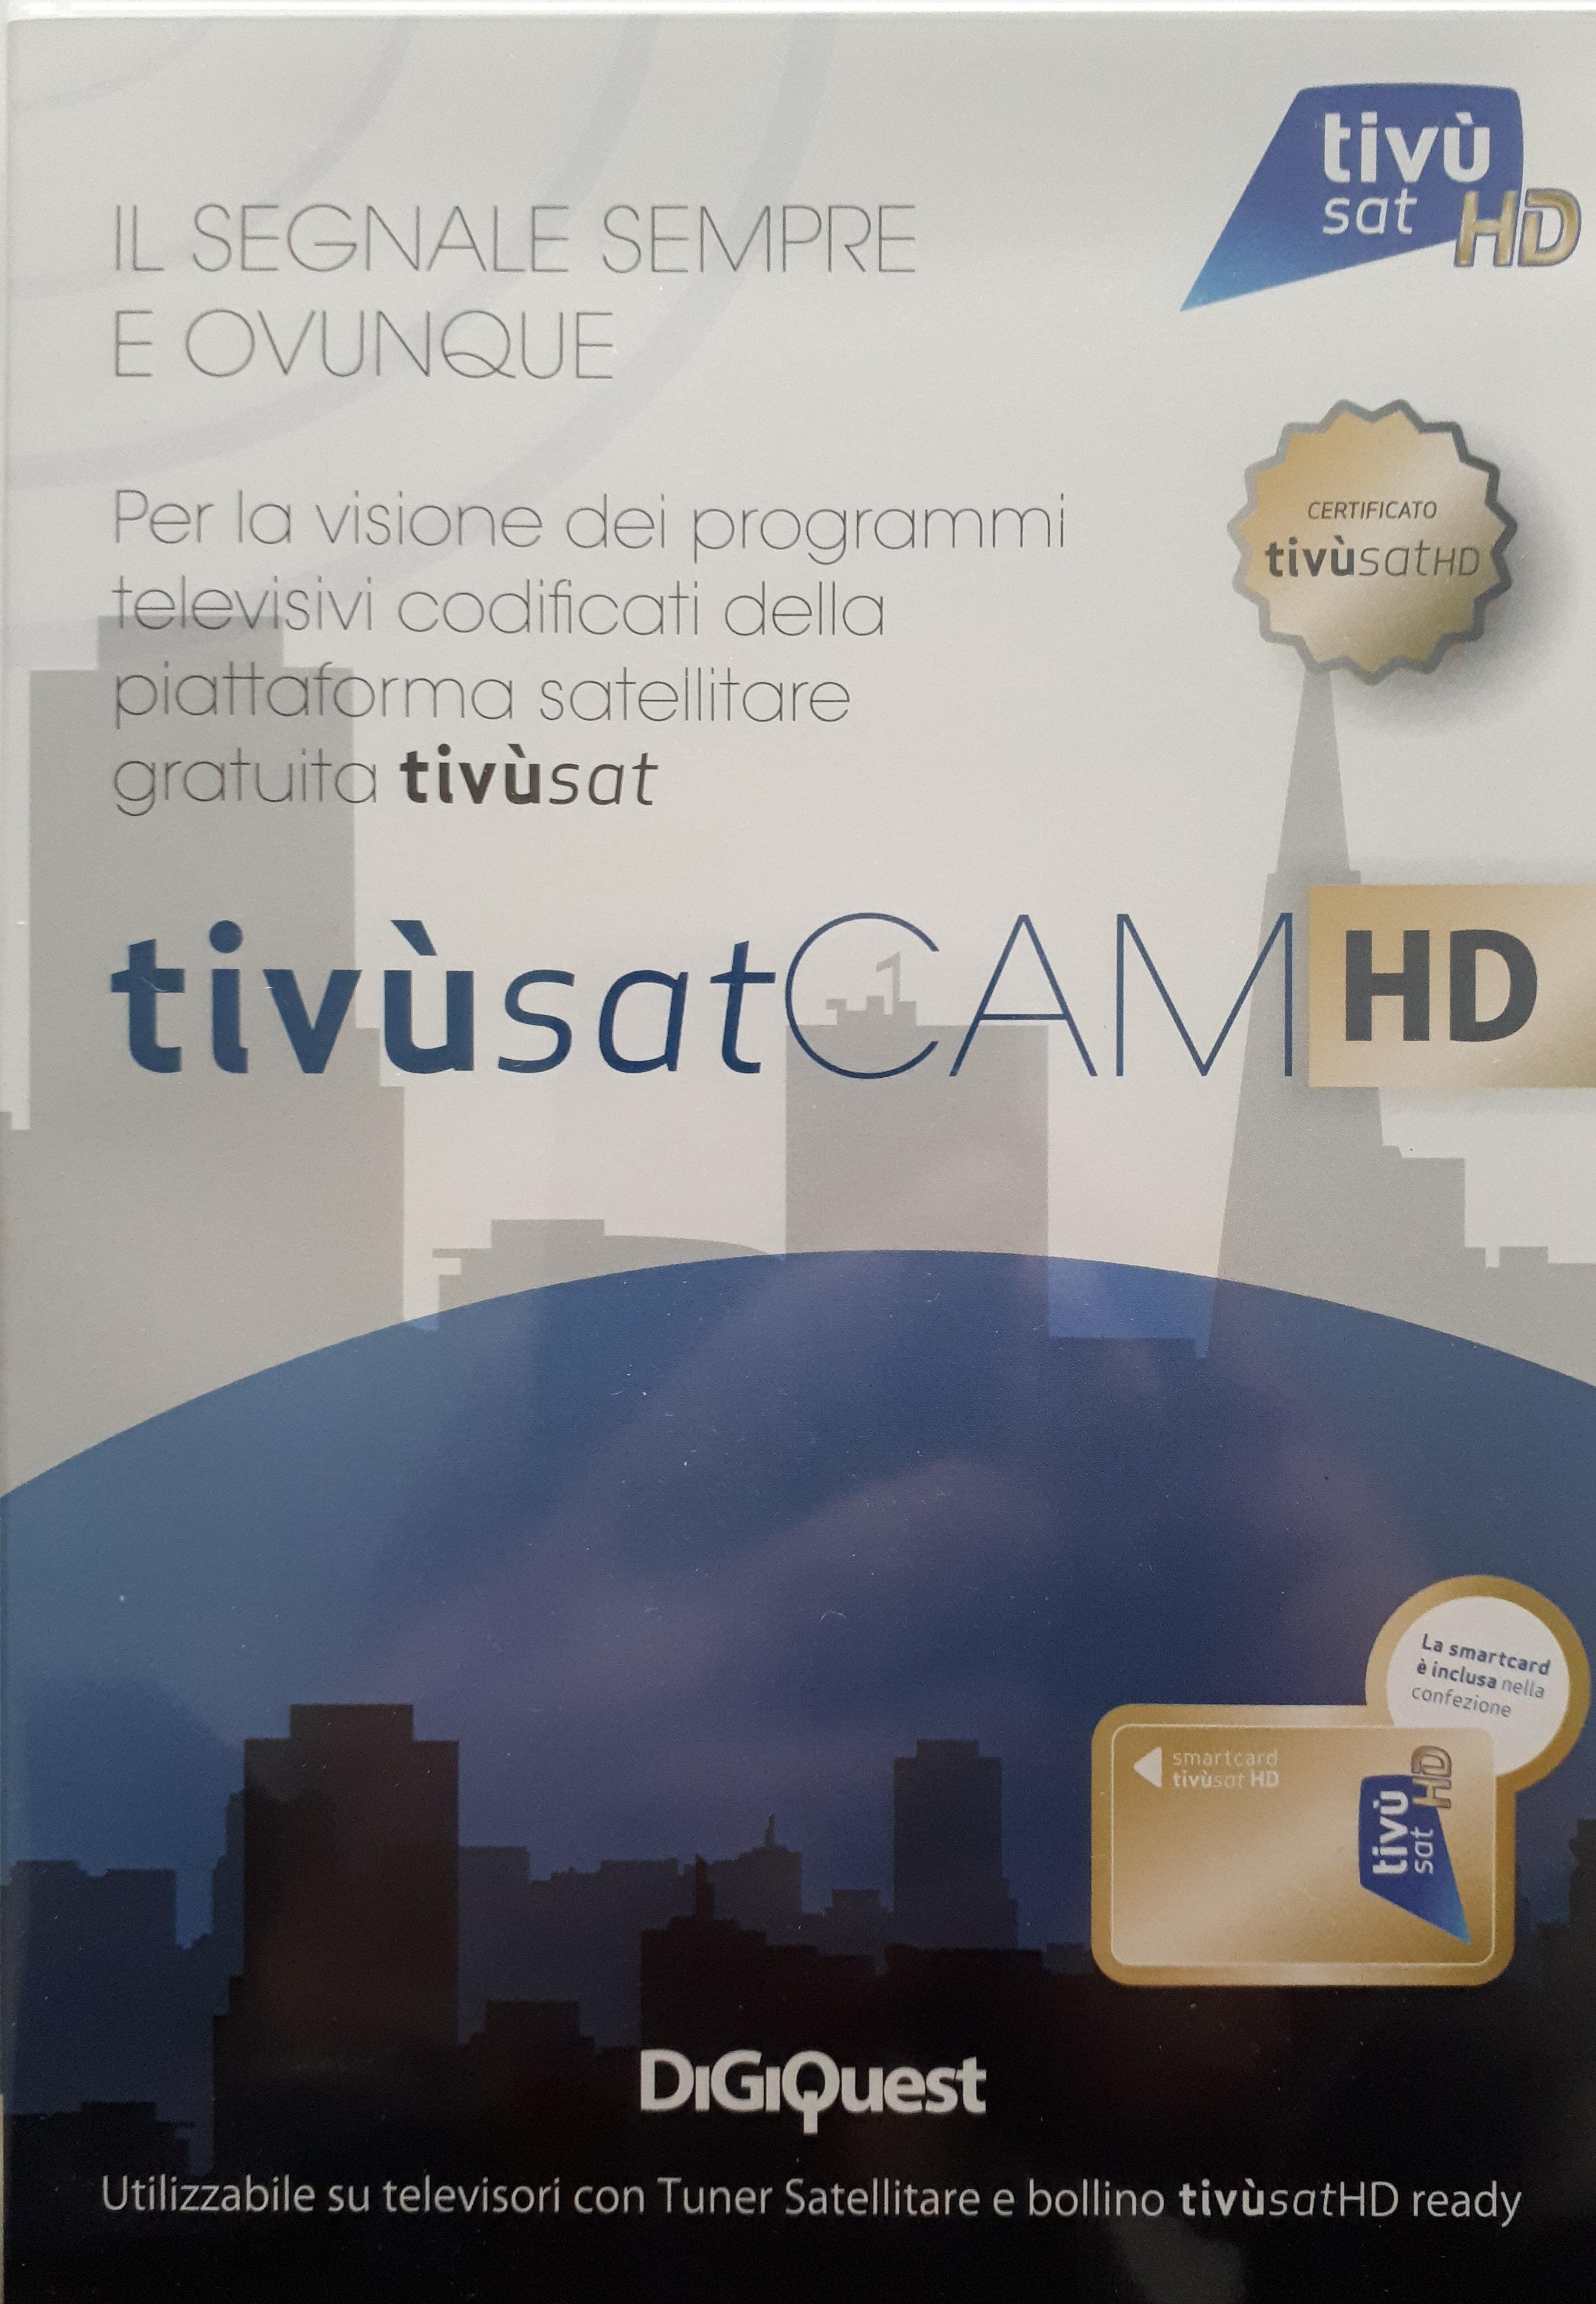 Tivusat Karte.Tivusat Smartcam Hd Ci Modul Inkl Tivu Sat Karte